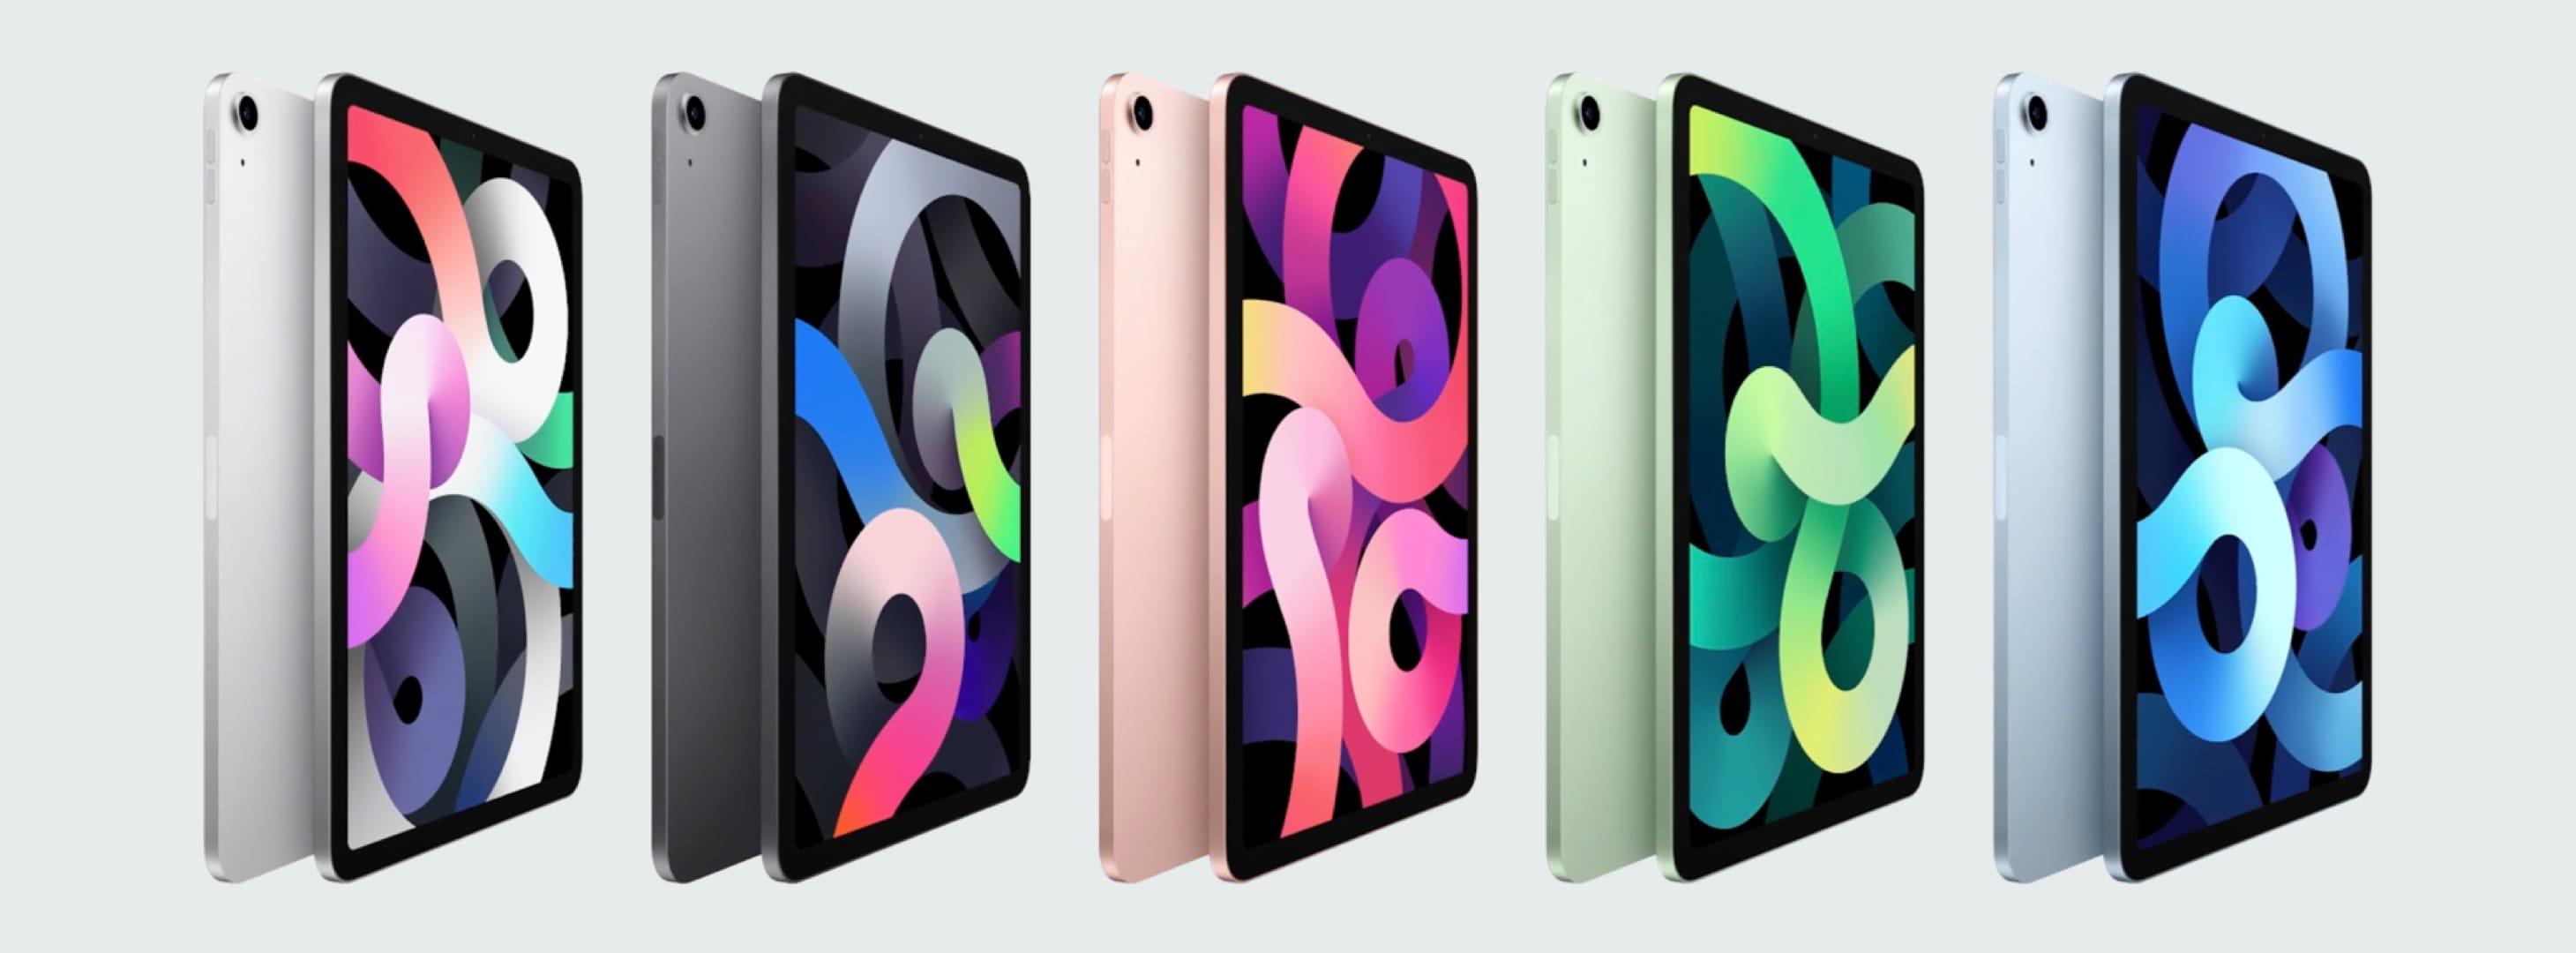 allapplenews-ipad-air-2020-colors